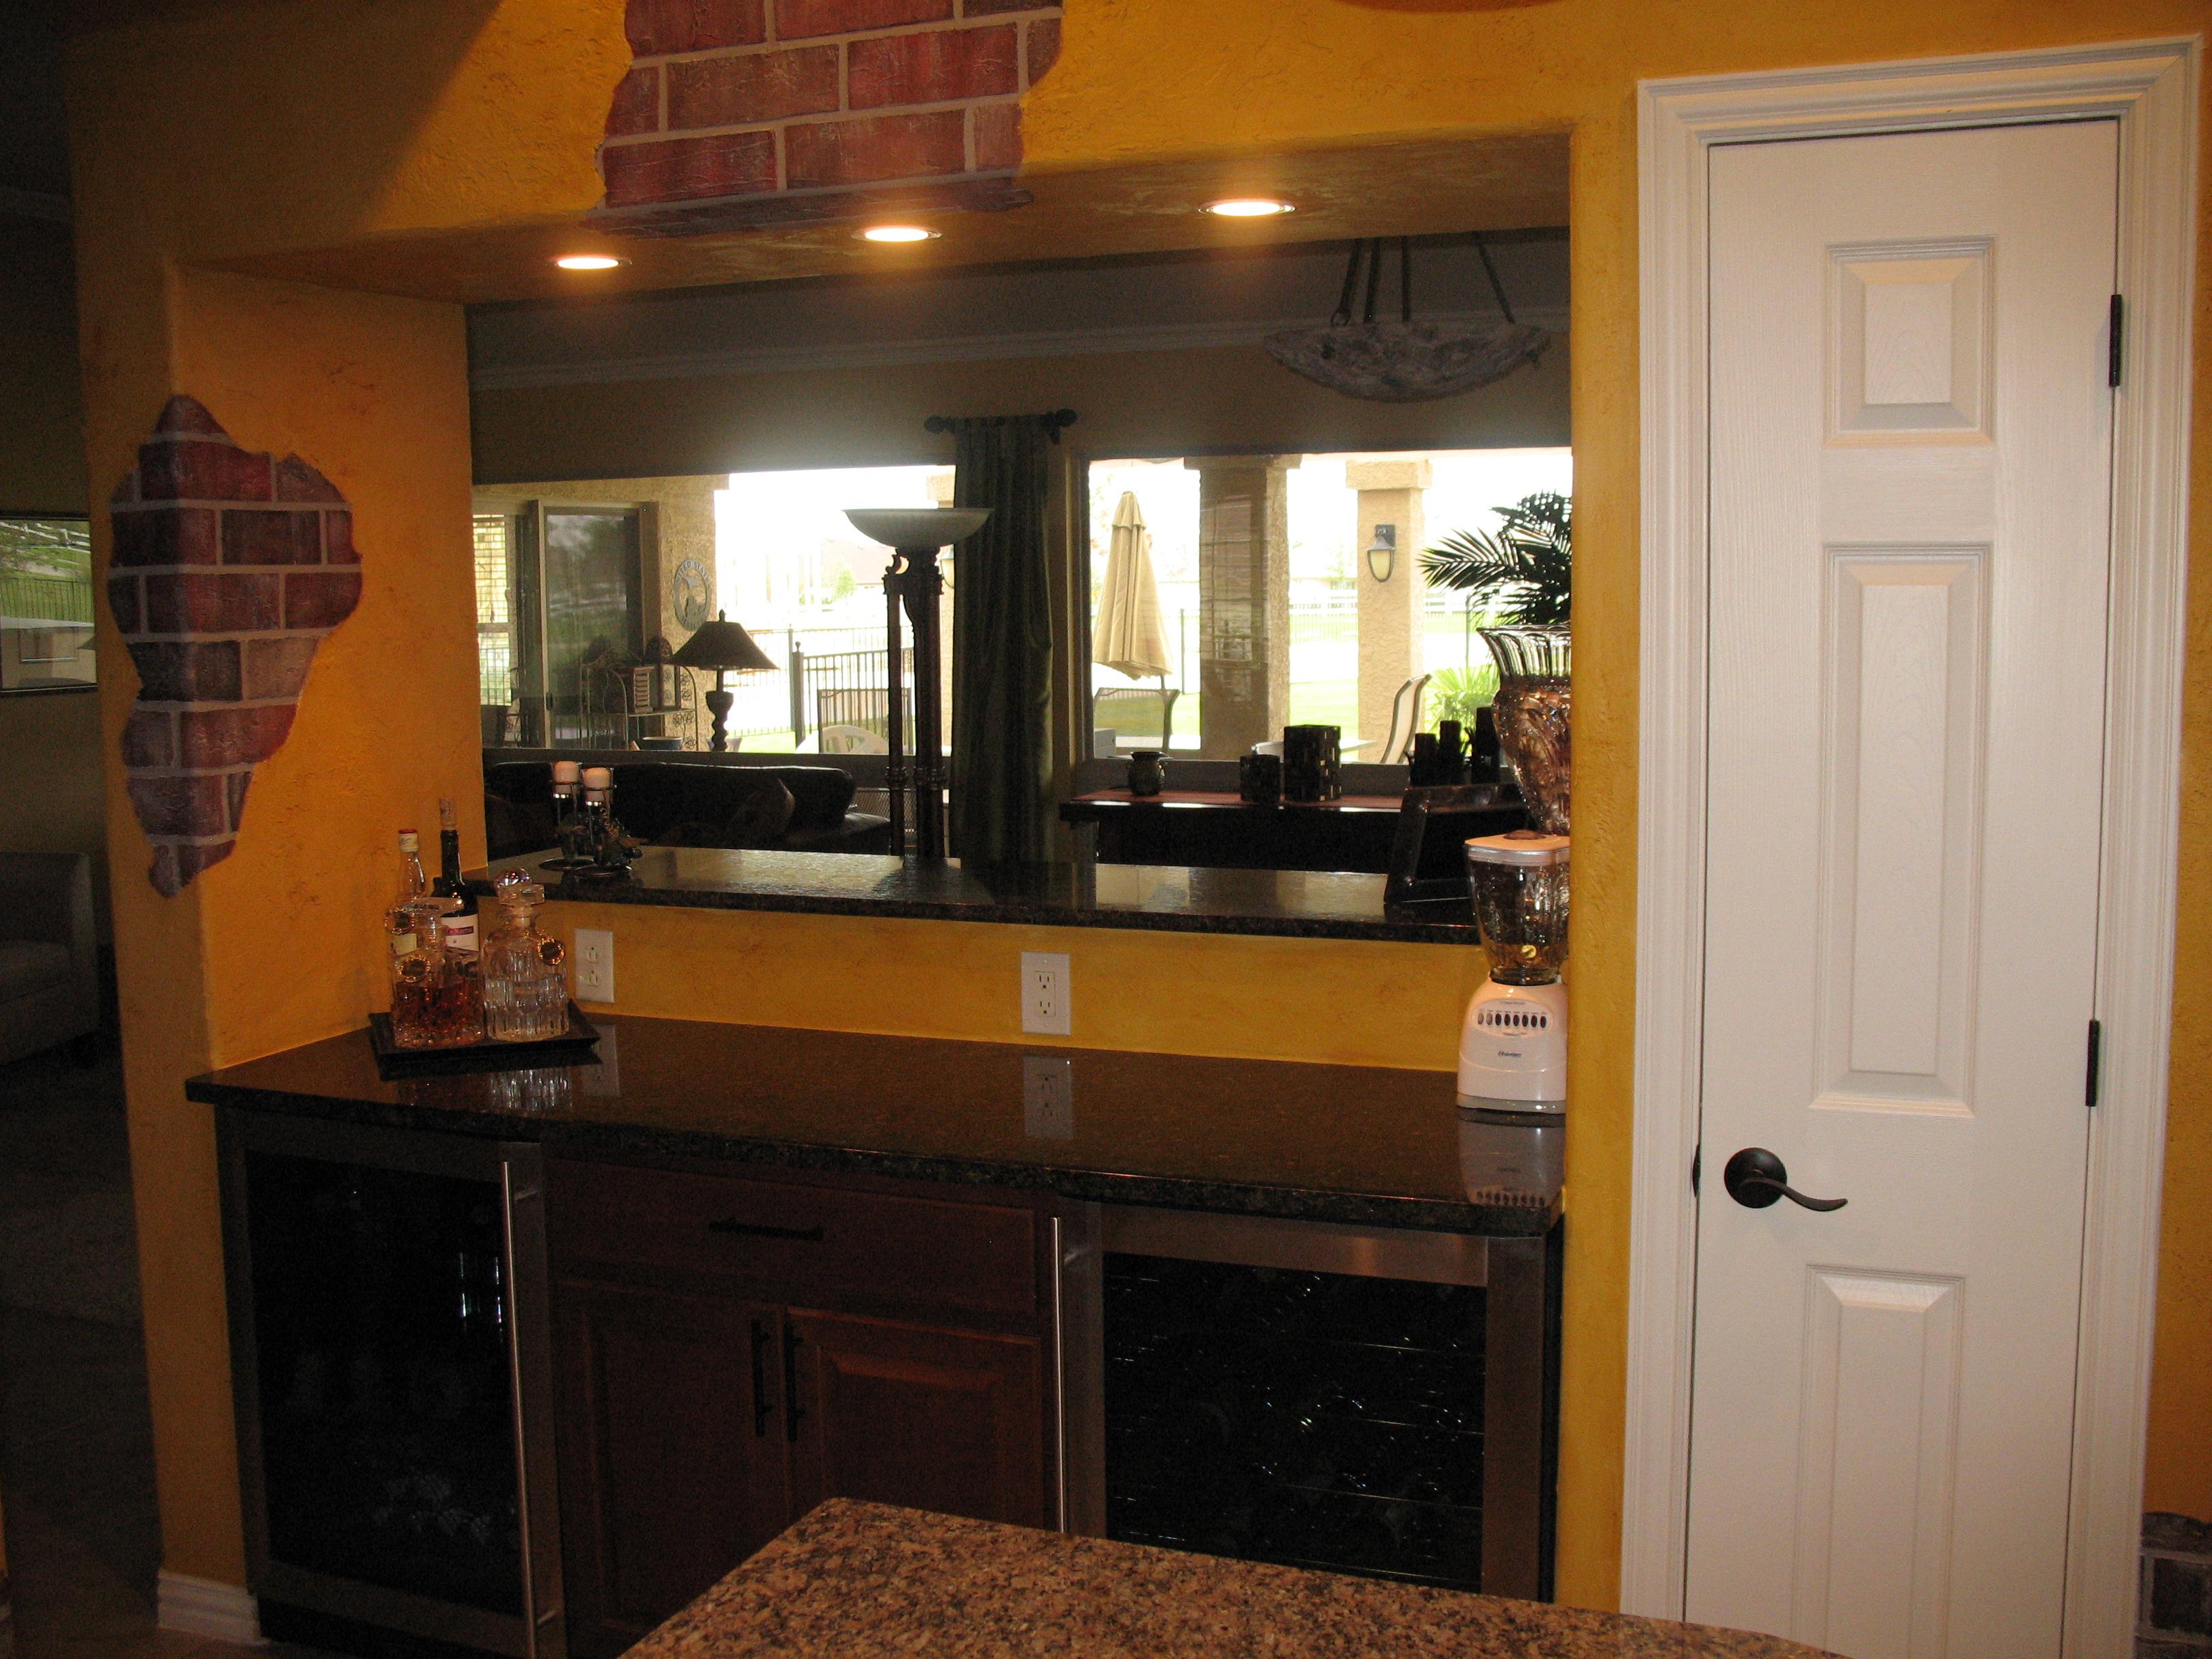 basements small bars and house designs kitchen for on area bar home design ideas best business pub closet decor basement